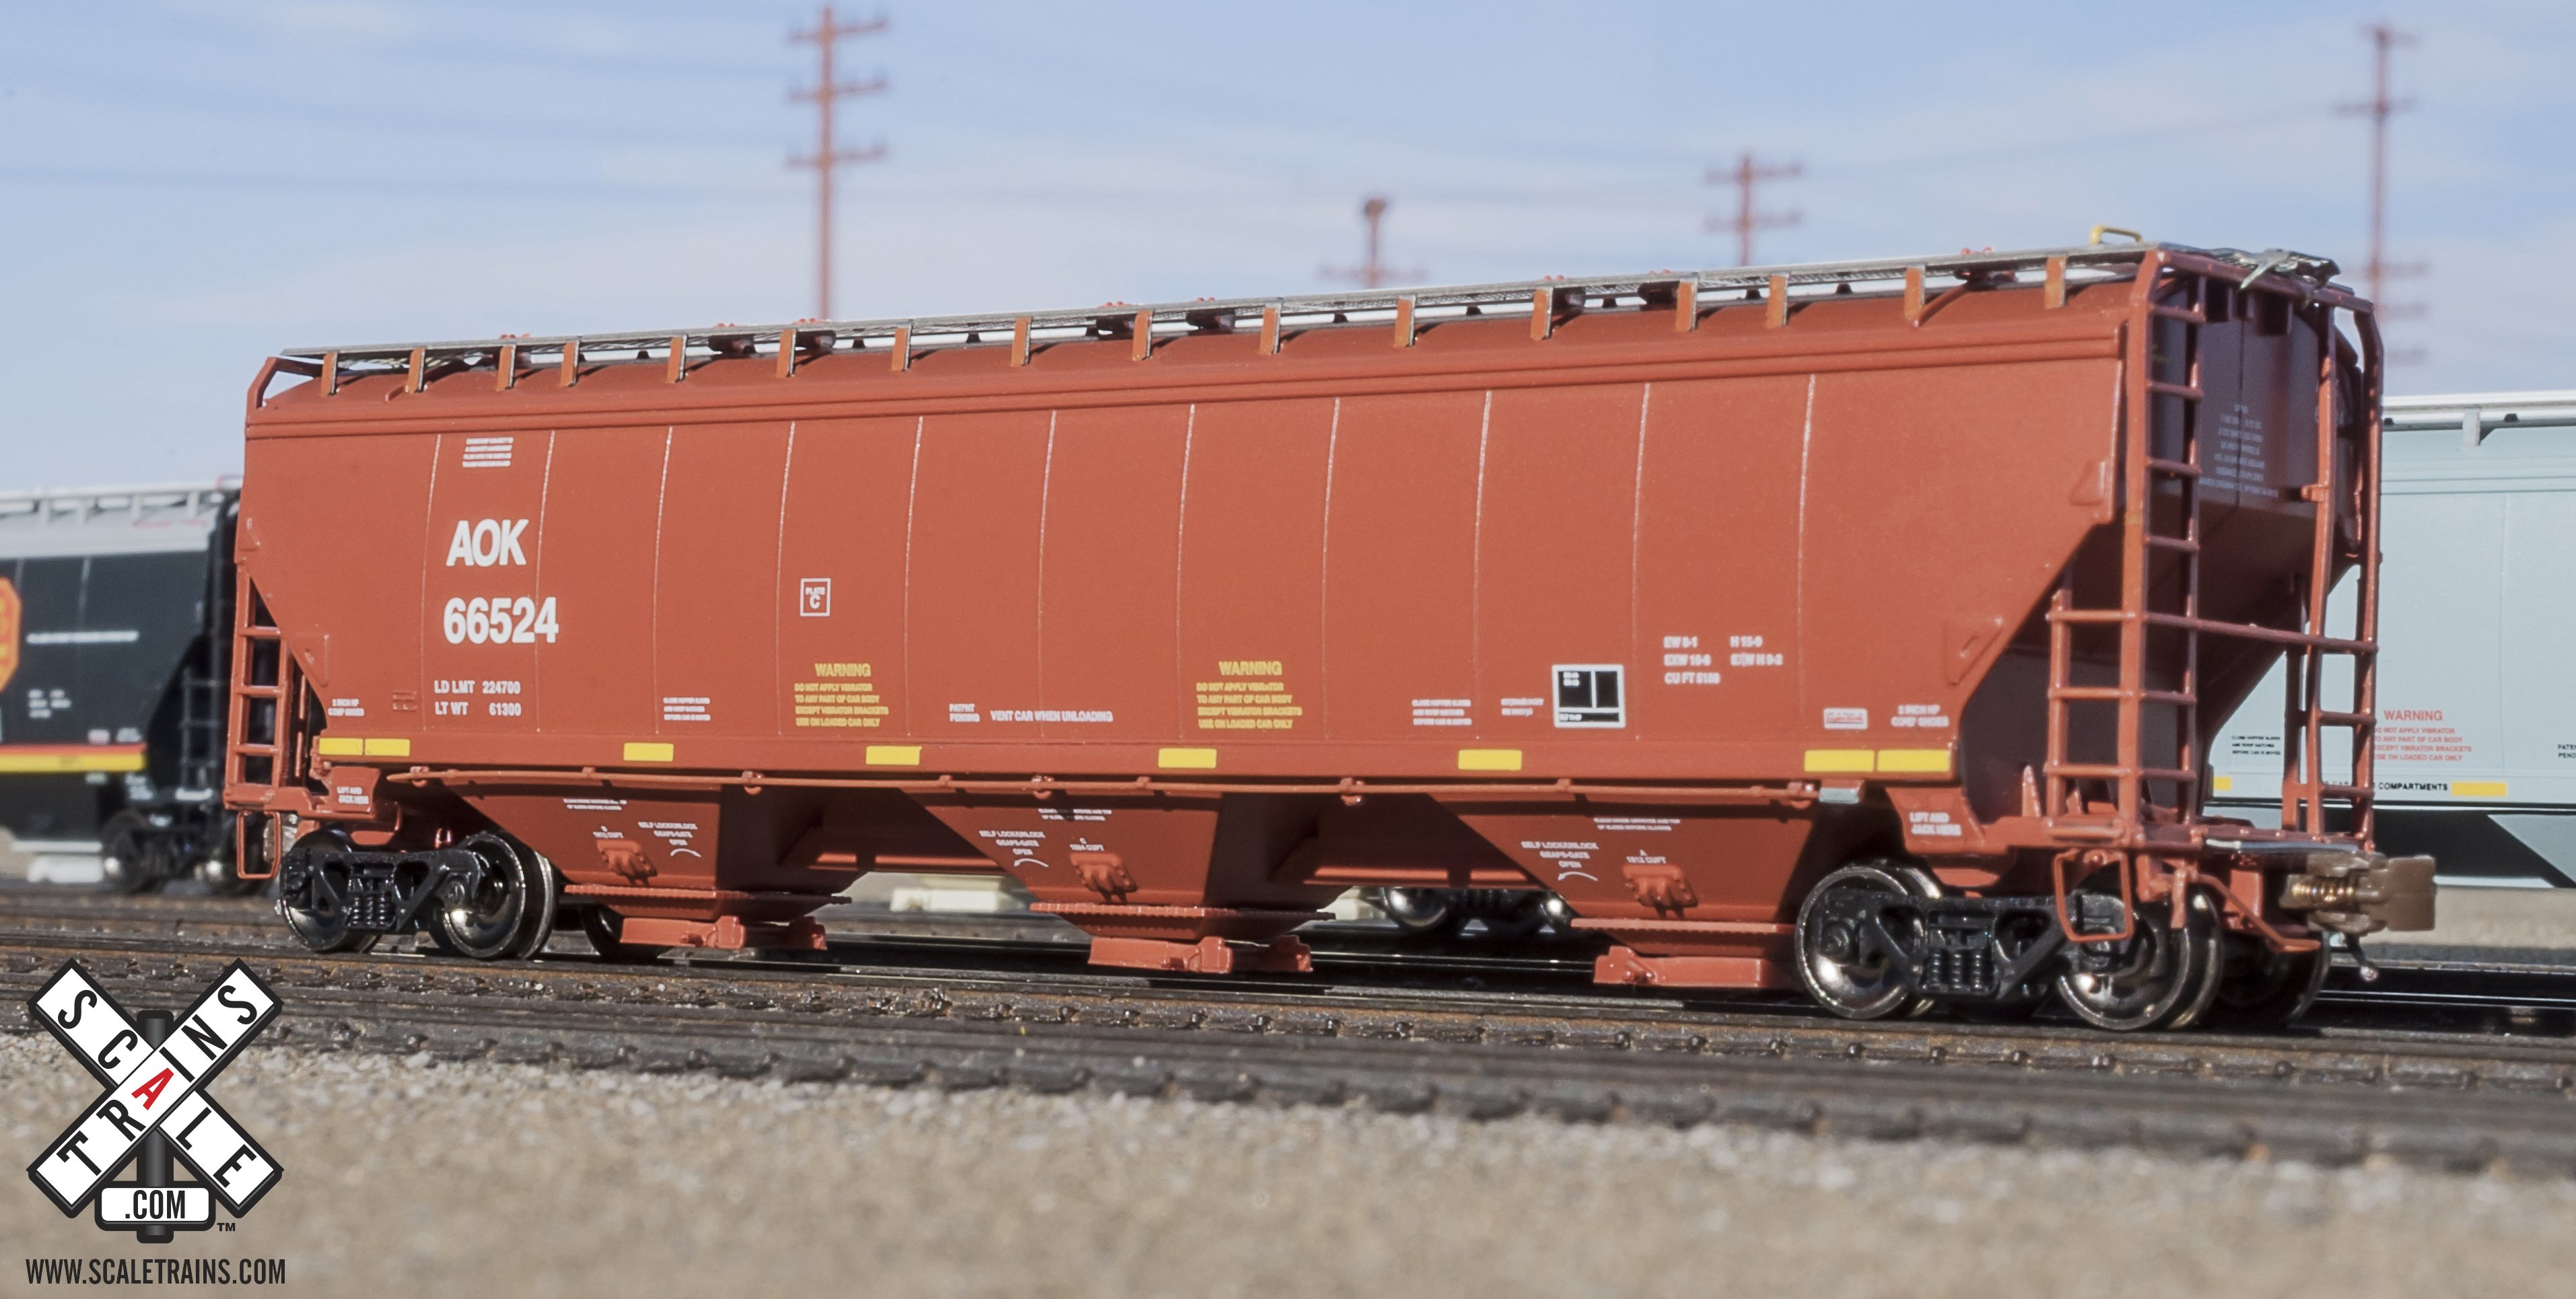 N Scale - ScaleTrains.com - SXT30901 - Covered Hopper, 3-Bay, Gunderson 5188 - Arkansas-Oklahoma - 66570